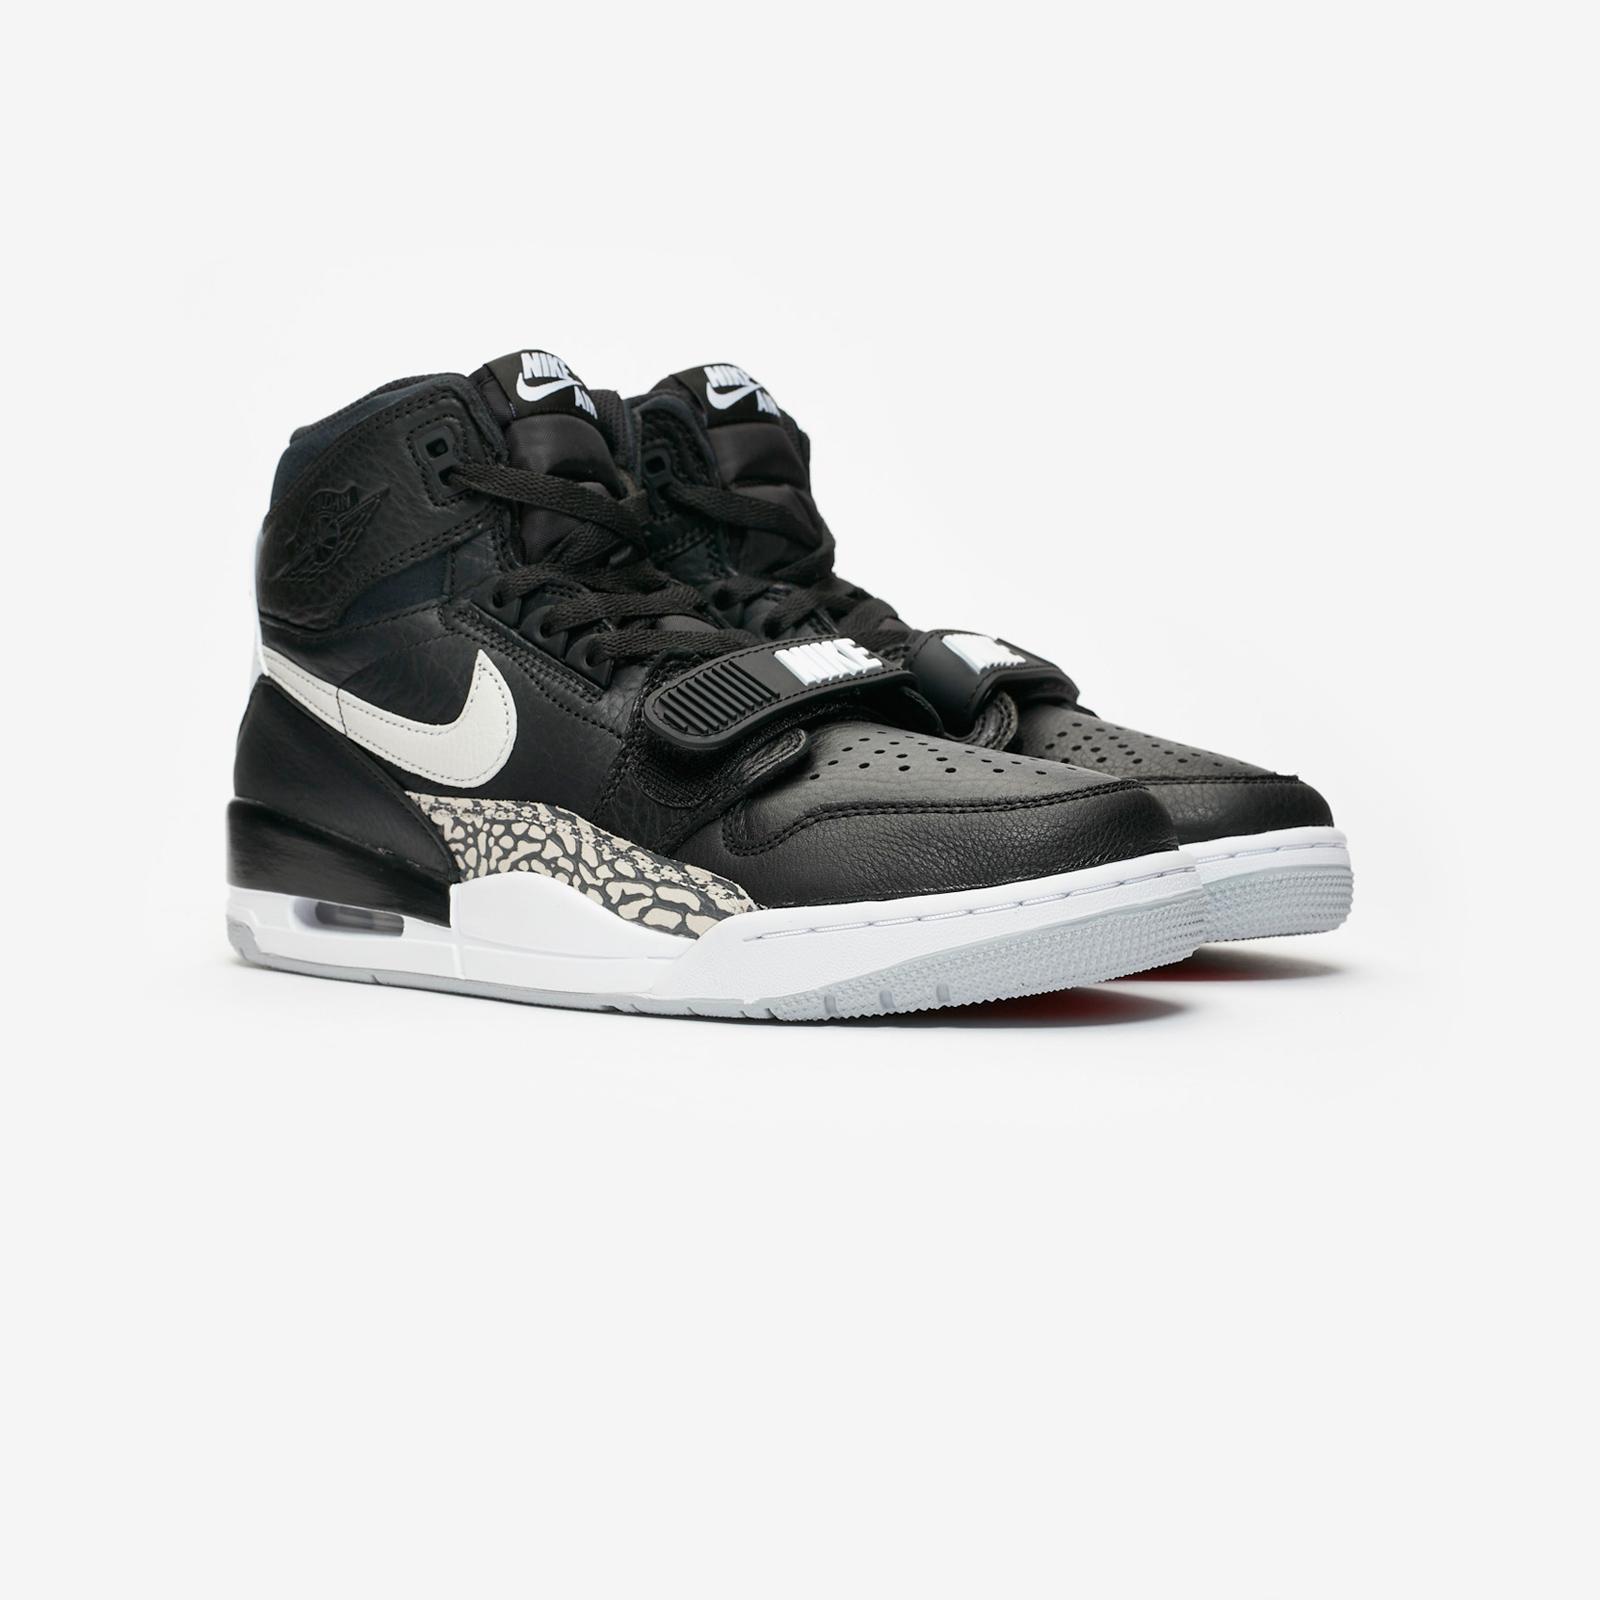 best website 4a9be b6a0c Jordan Brand Air Jordan Legacy 312 - Av3922-001 ...